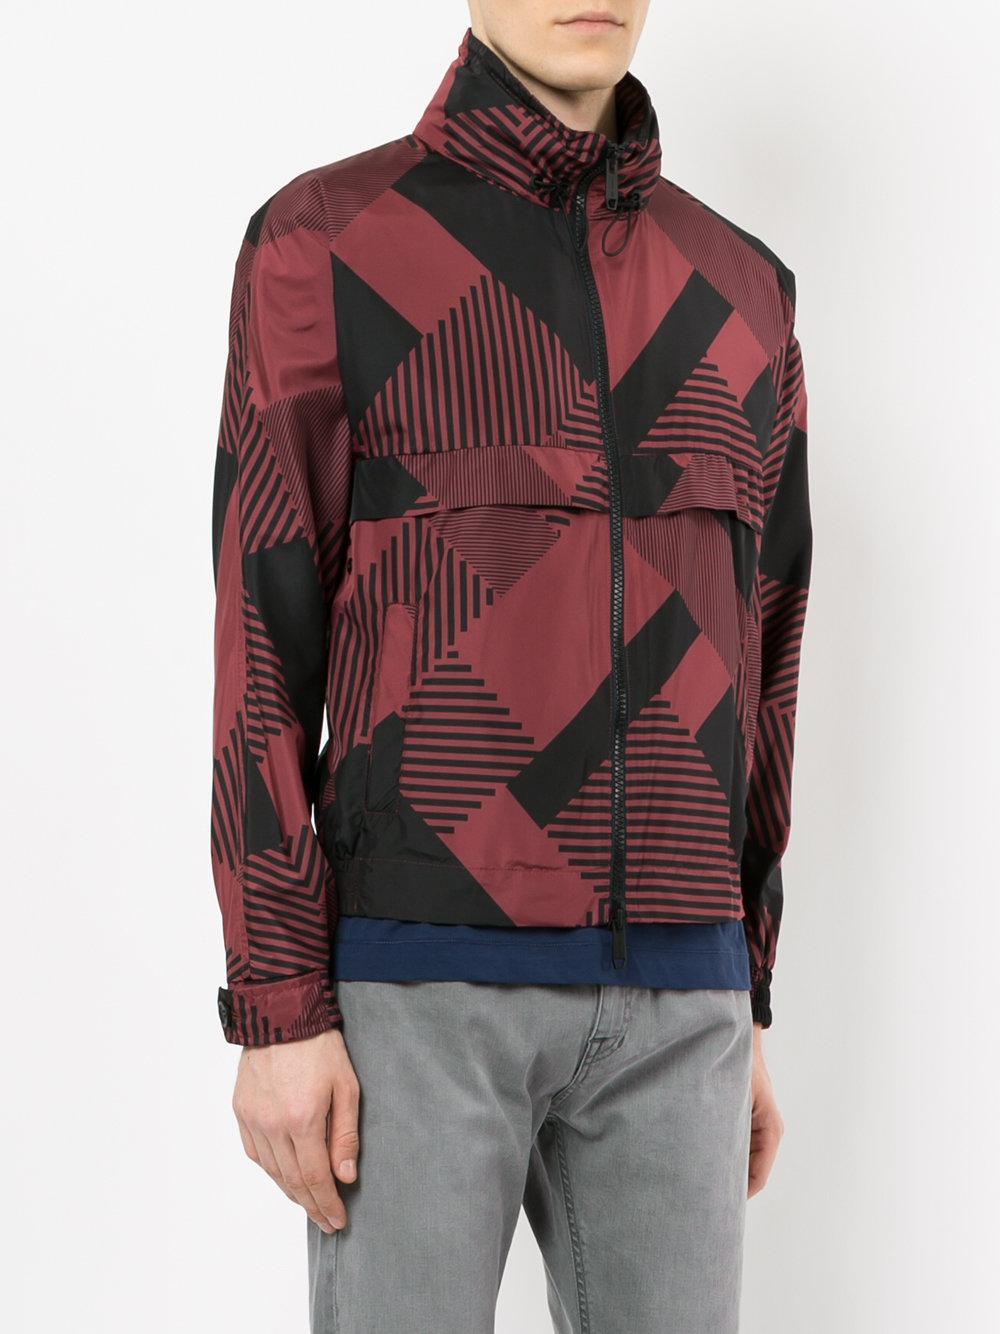 Cerruti 1881 Synthetic Printed Windbreaker Jacket in Red for Men